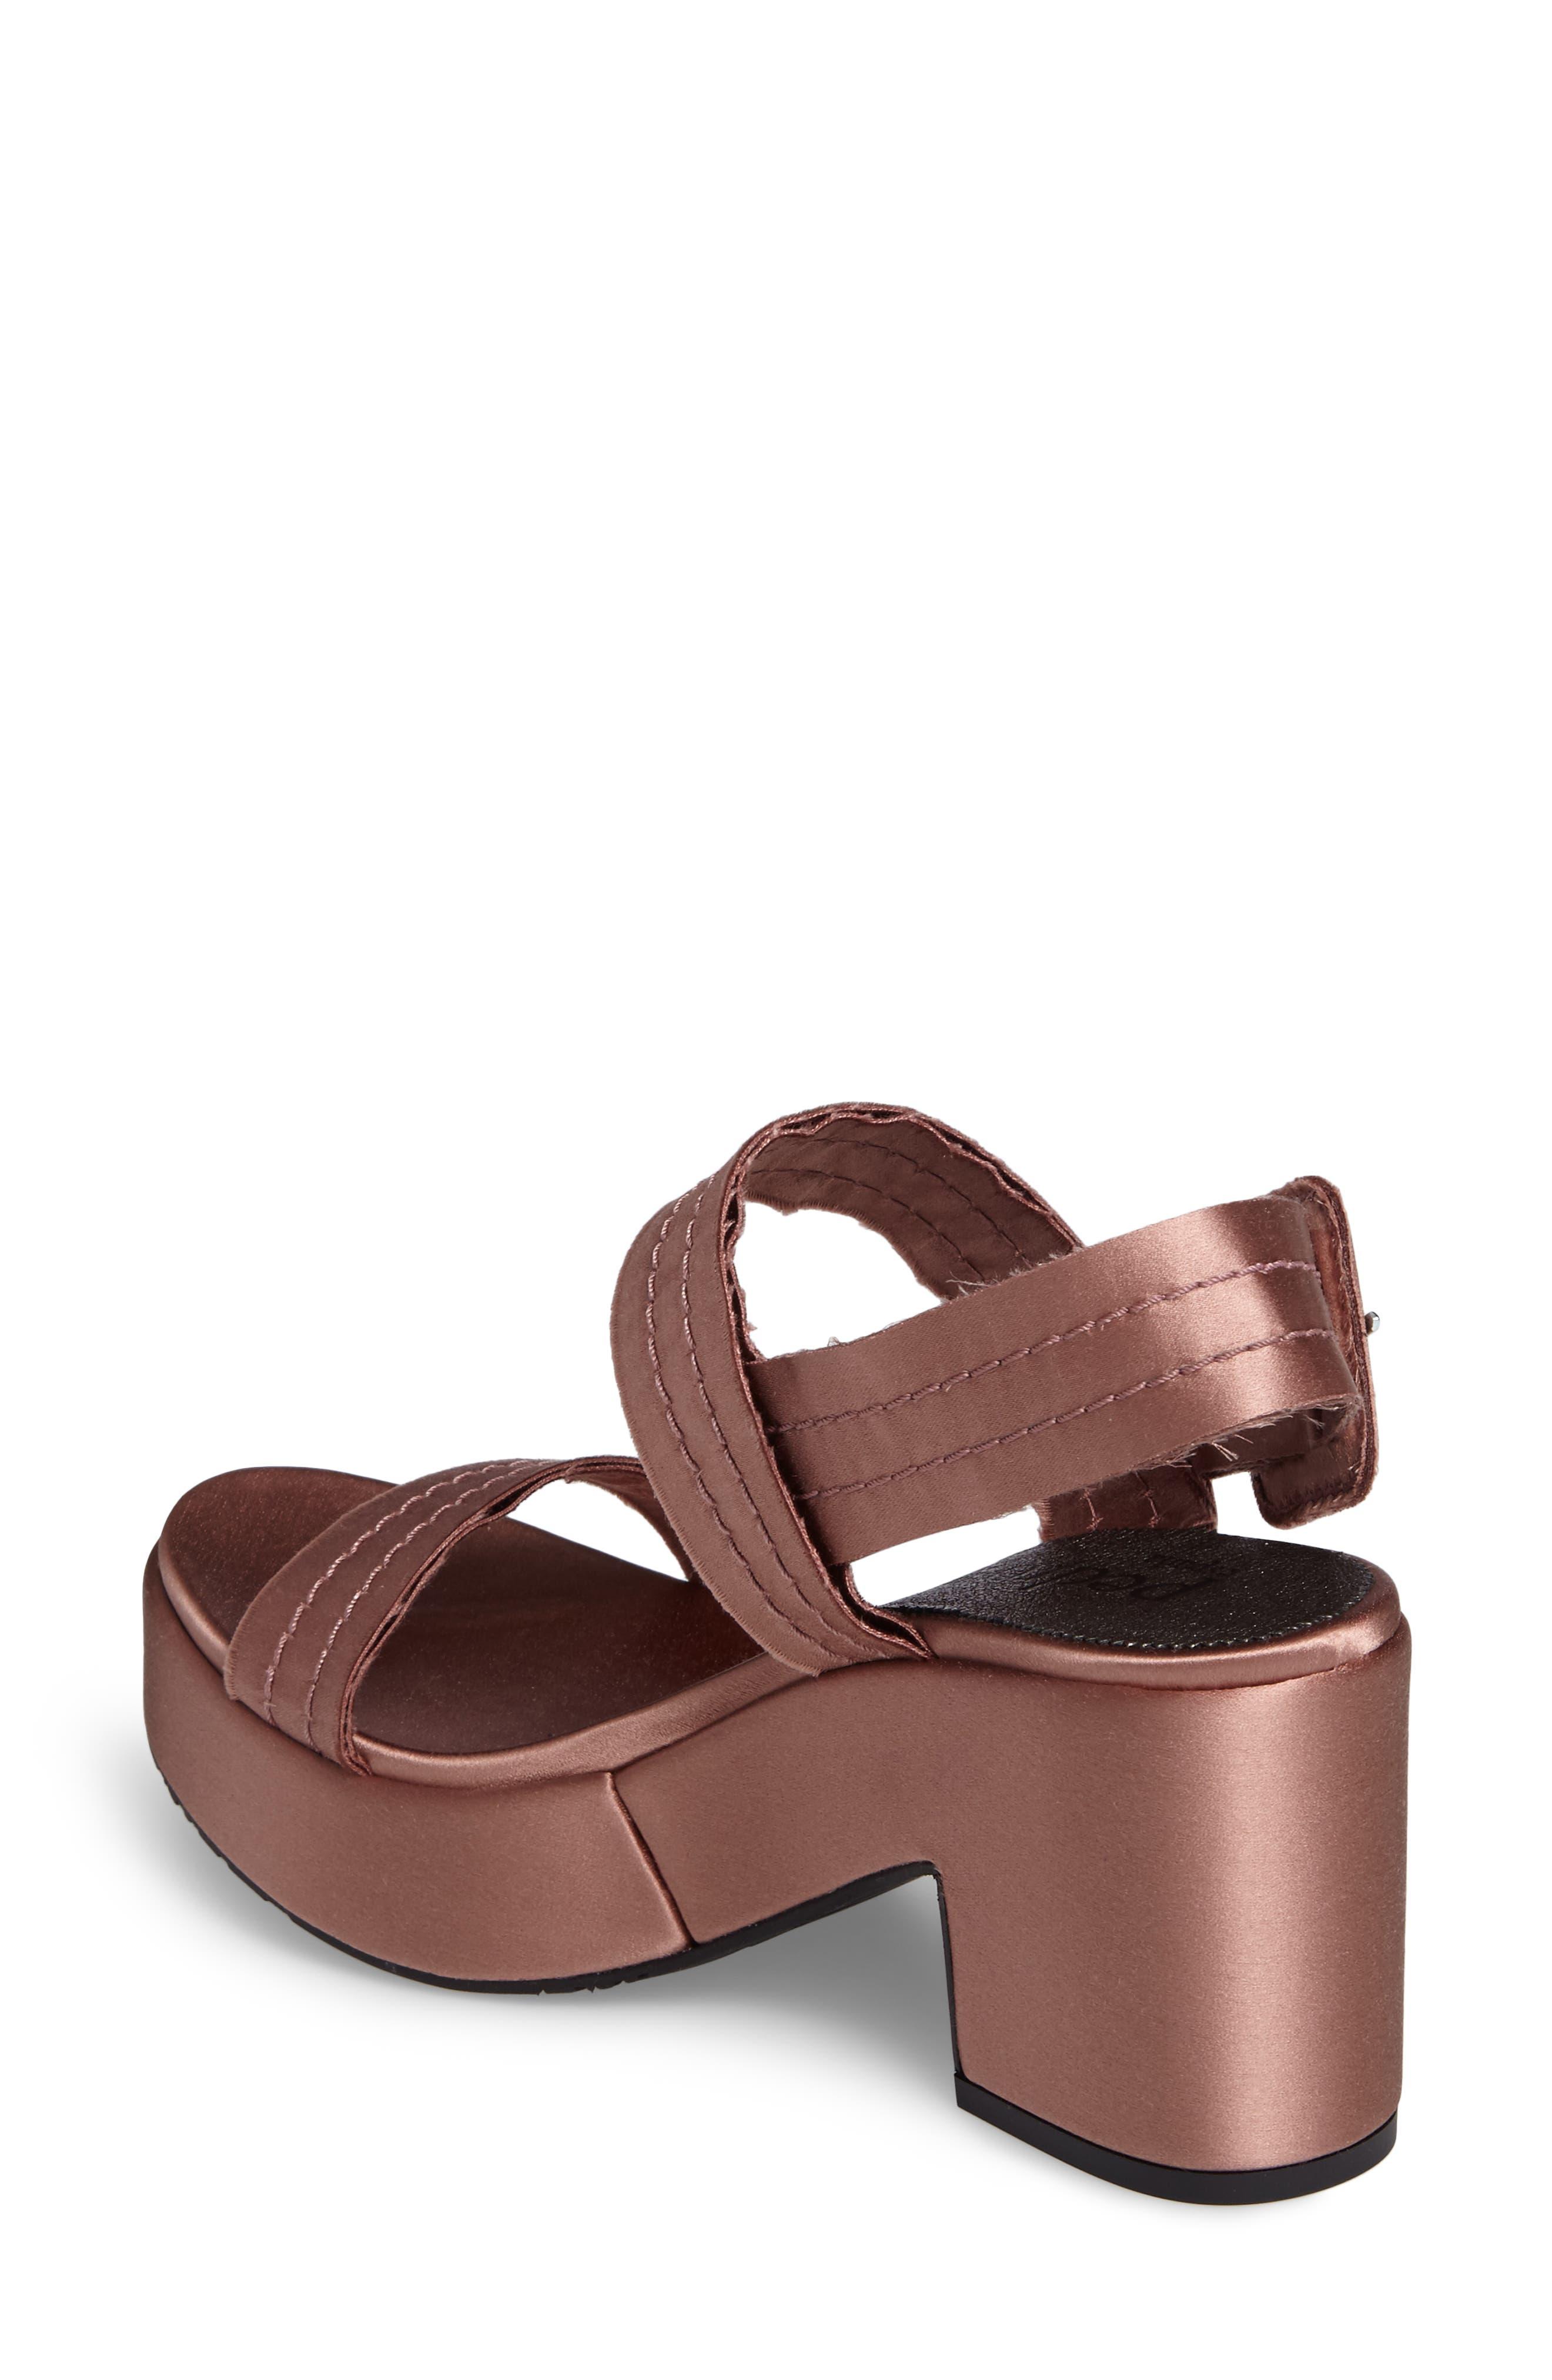 Decima Platform Sandal,                             Alternate thumbnail 2, color,                             Powder Satin